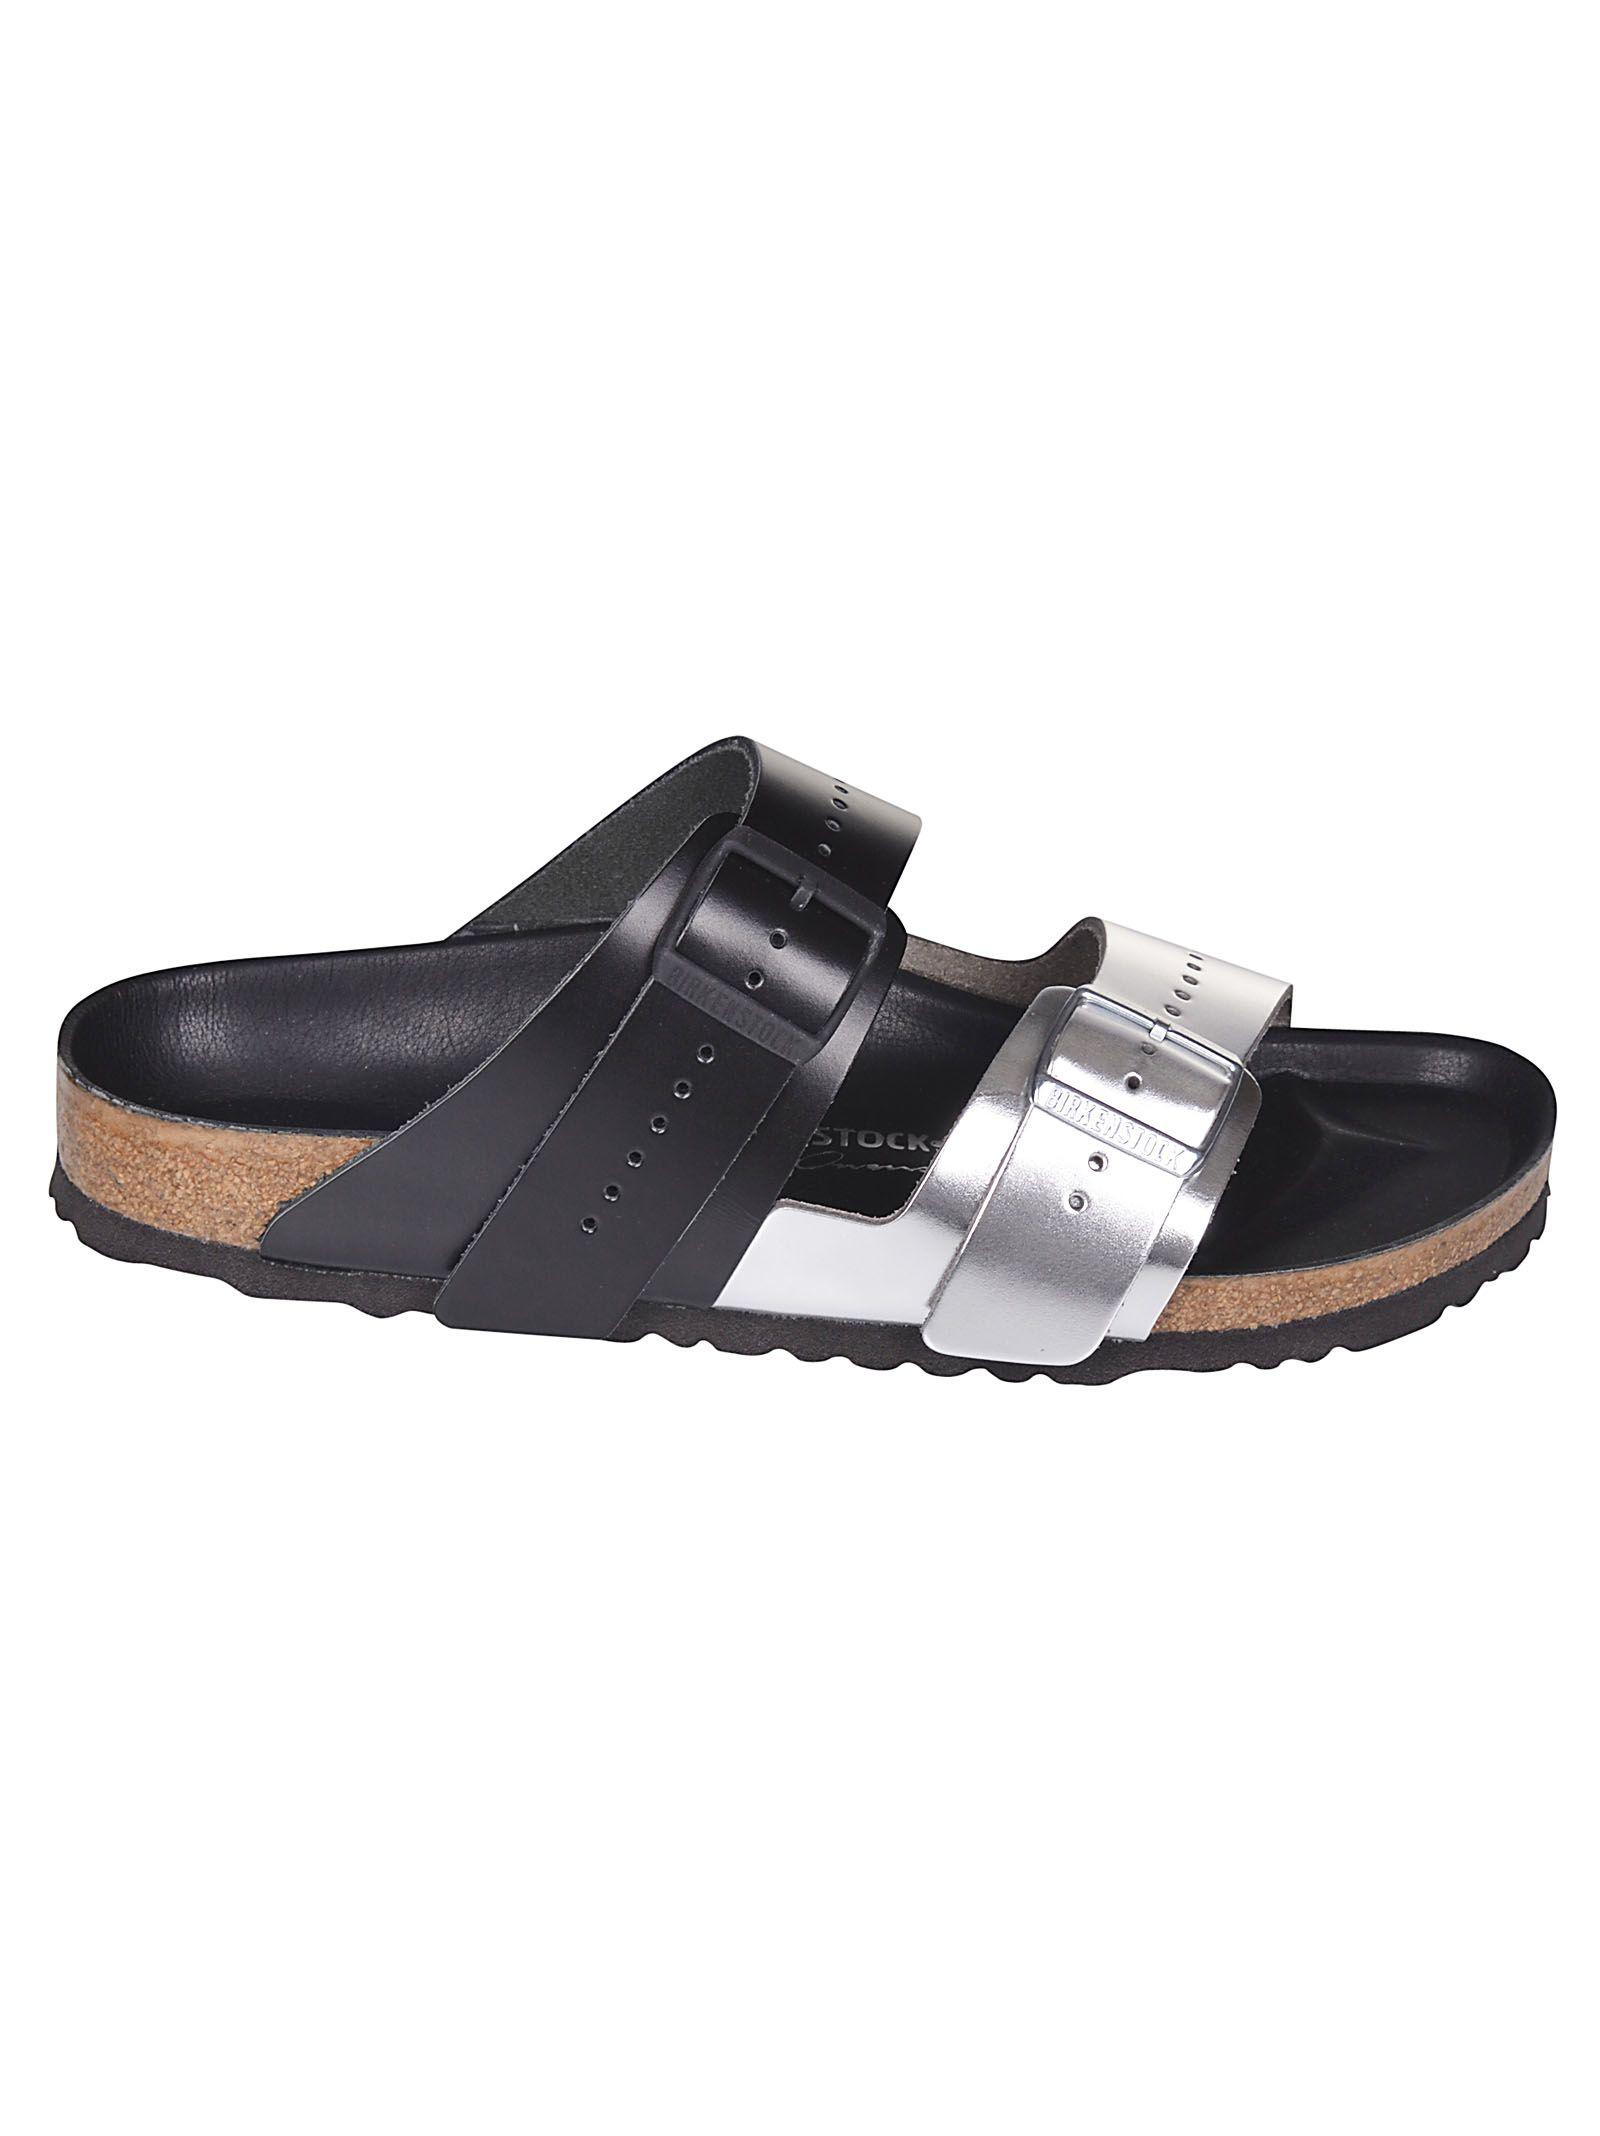 a34ff4dfccf0 Rick Owens + Birkenstock Arizona Two-Tone Leather Sandals In Black ...